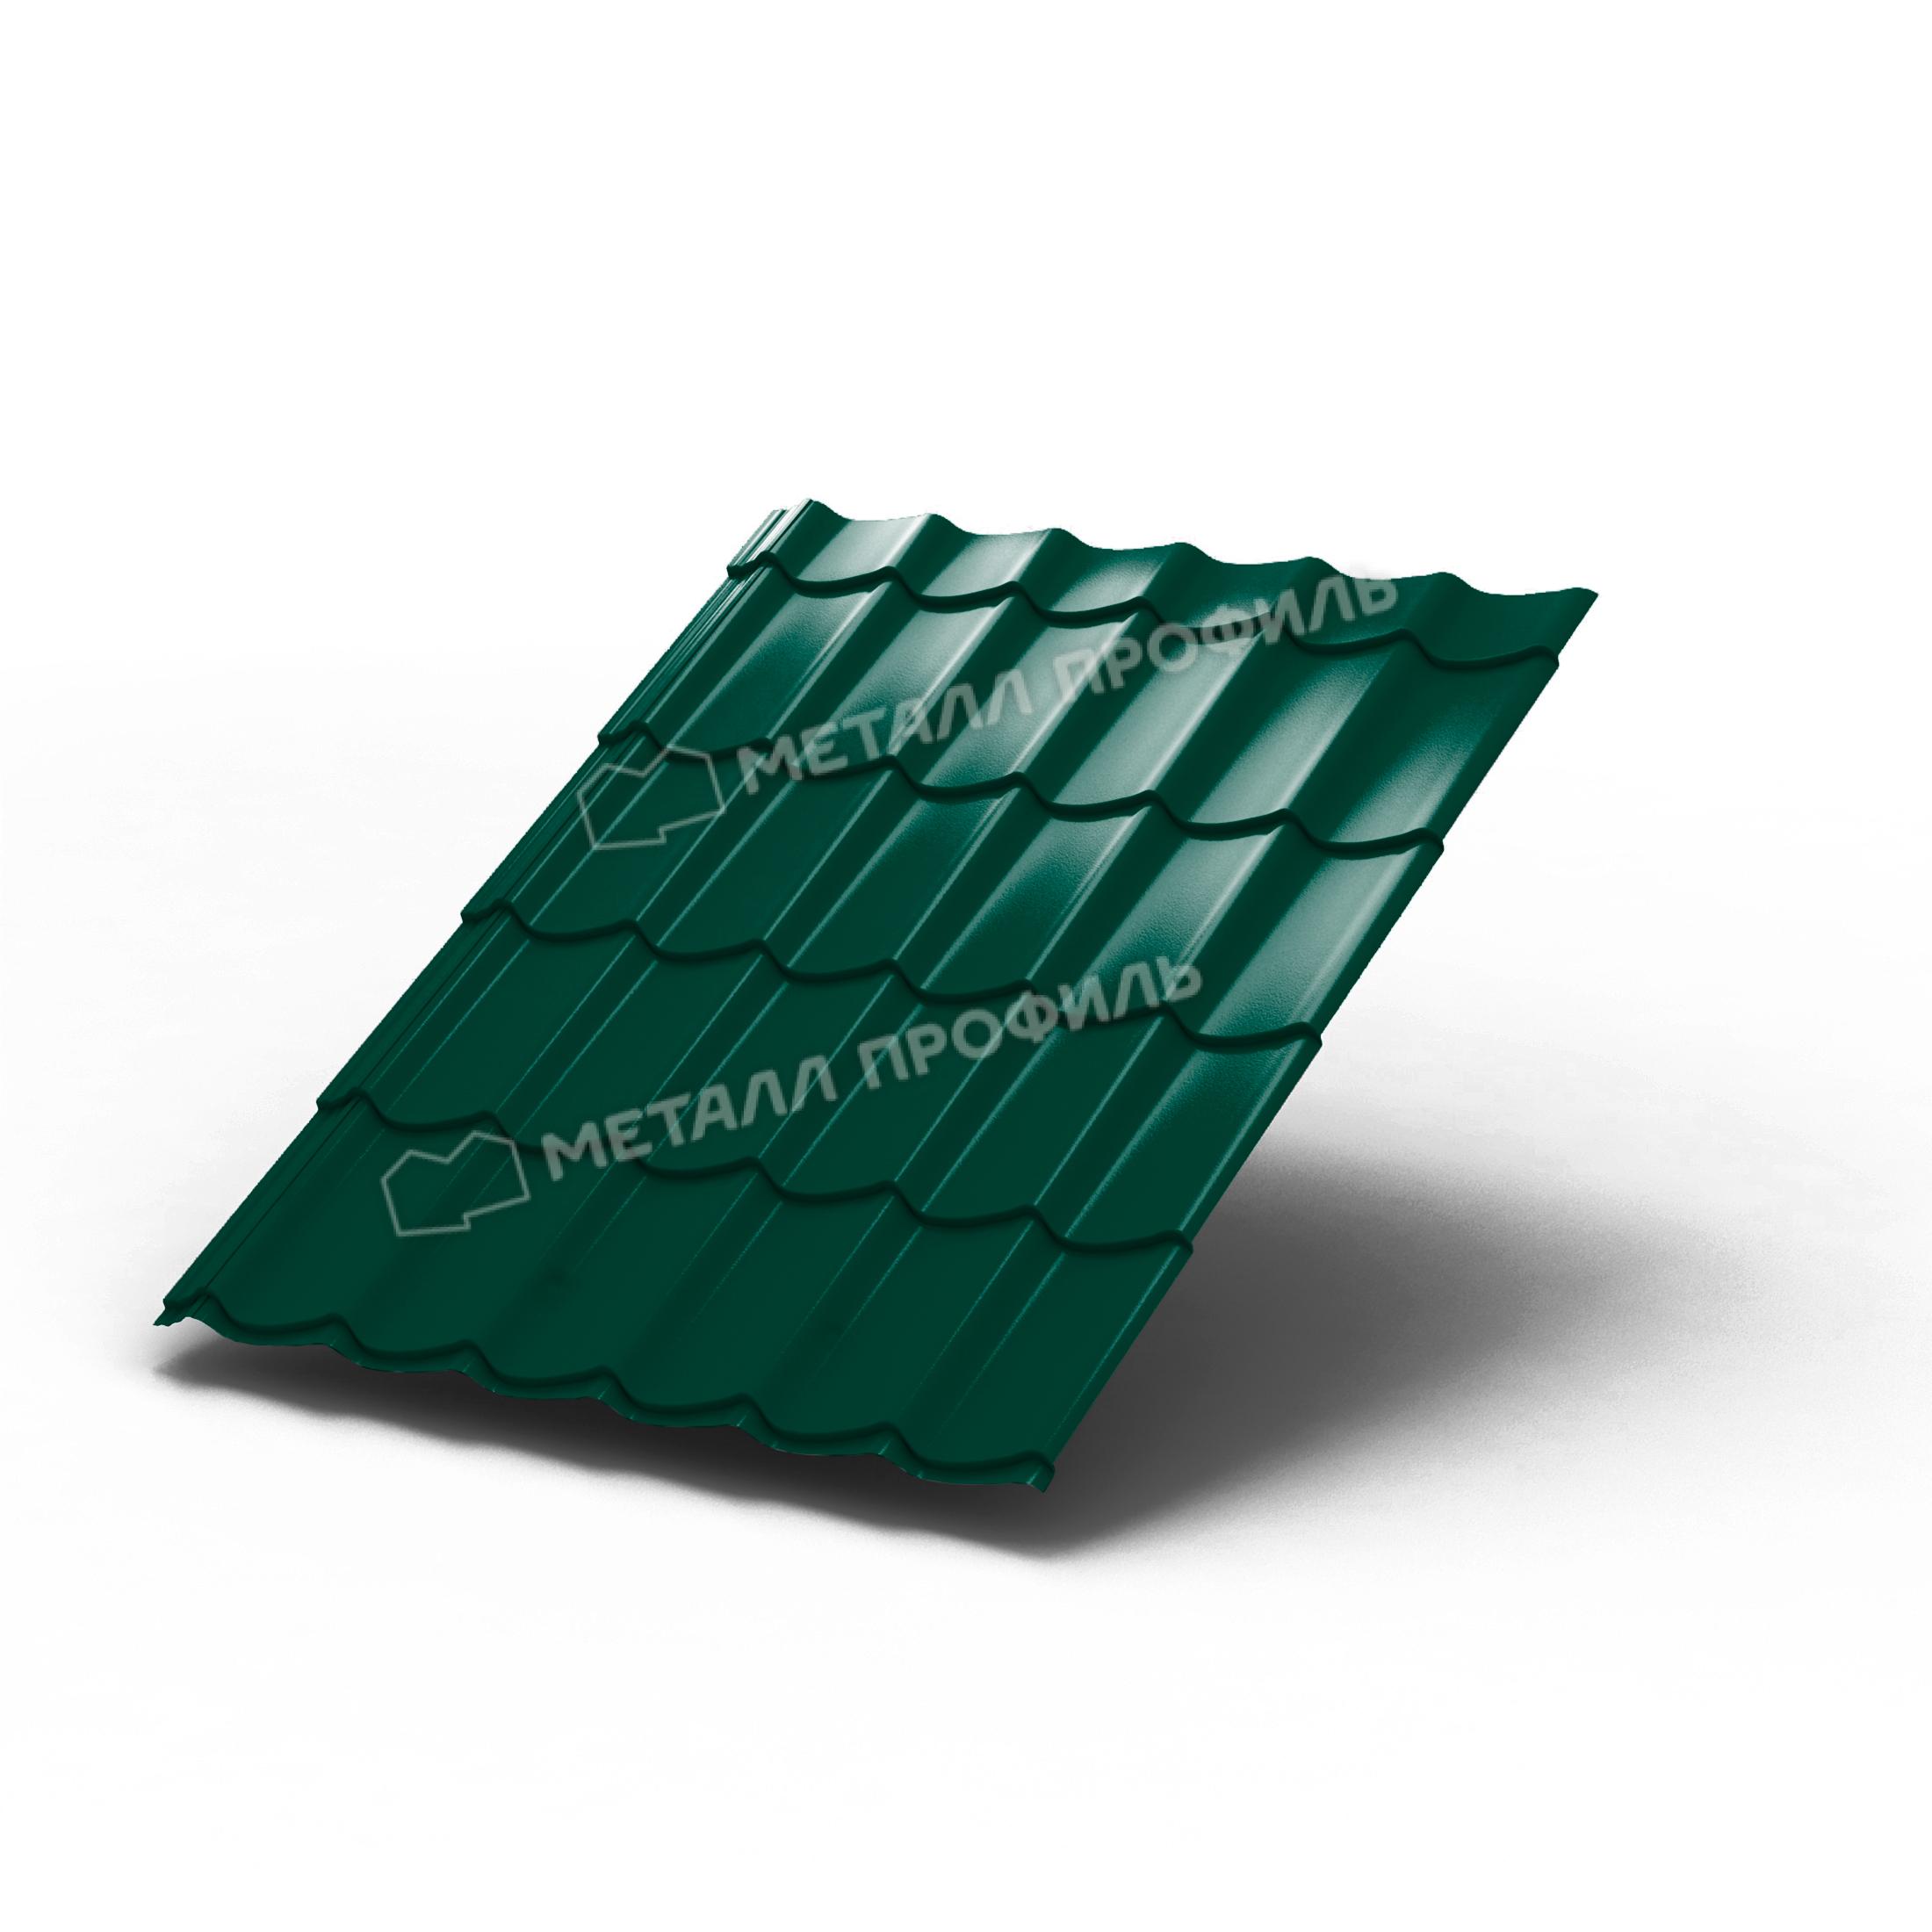 Металлочерепица МП Ламонтерра XL 0,45 мм Полиэстер, RAL 6005 (зеленый)